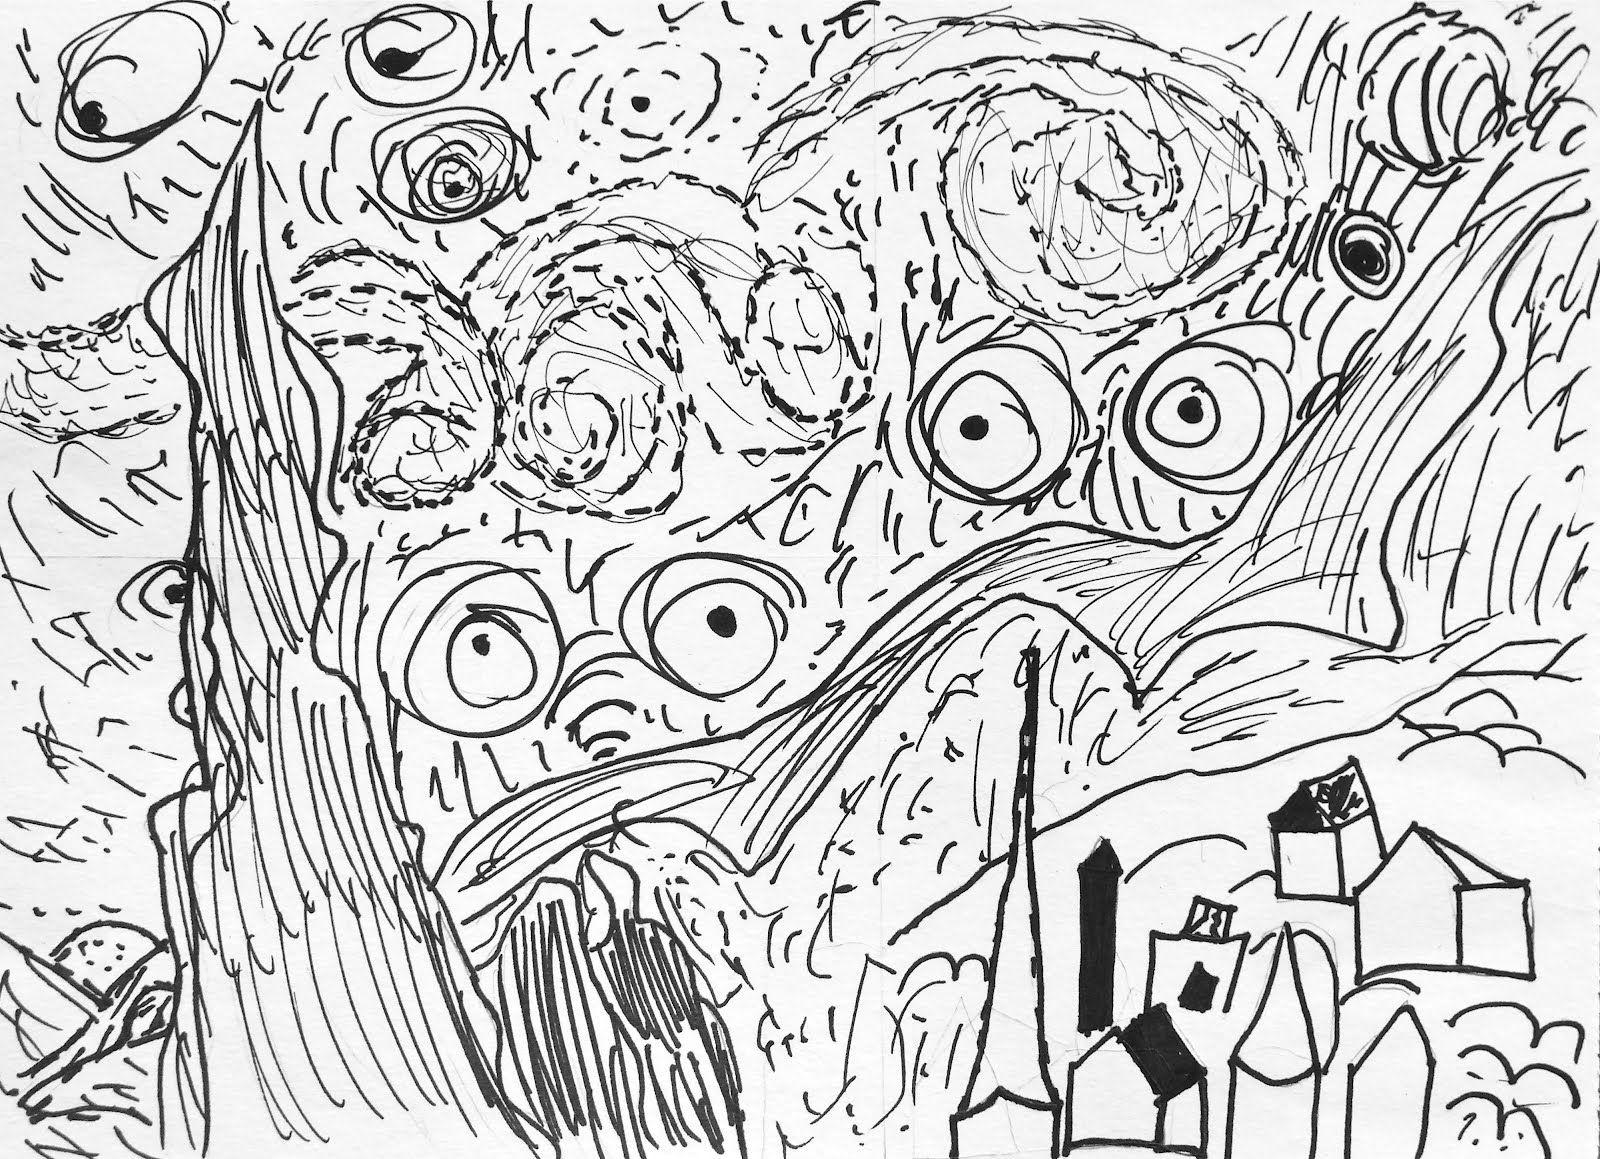 Van Gogh Coloring Pages | Blog-4-Students: Van Gogh Starry Night ...